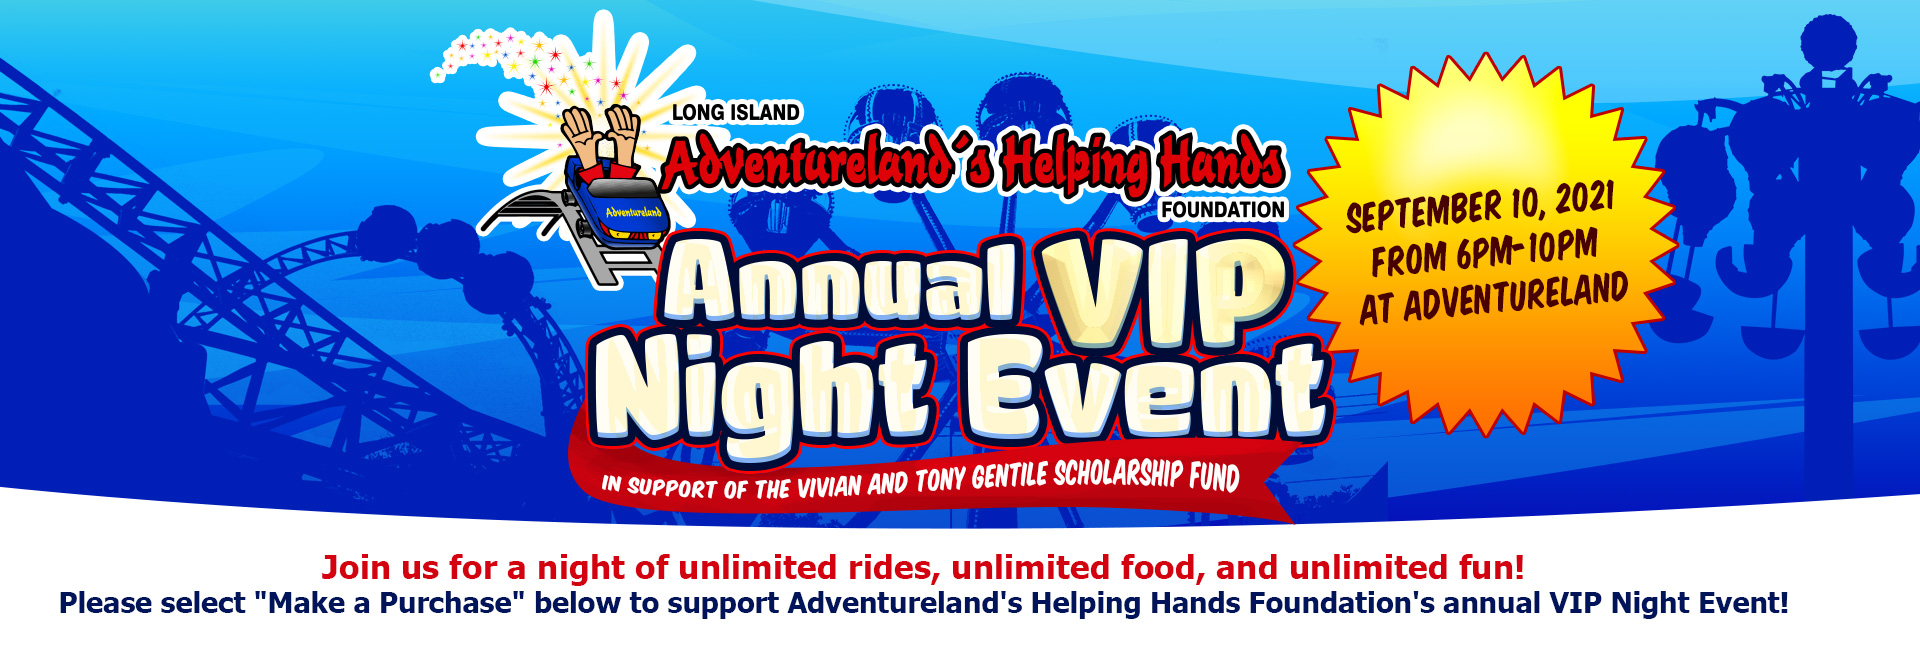 Annual VIP Night Event